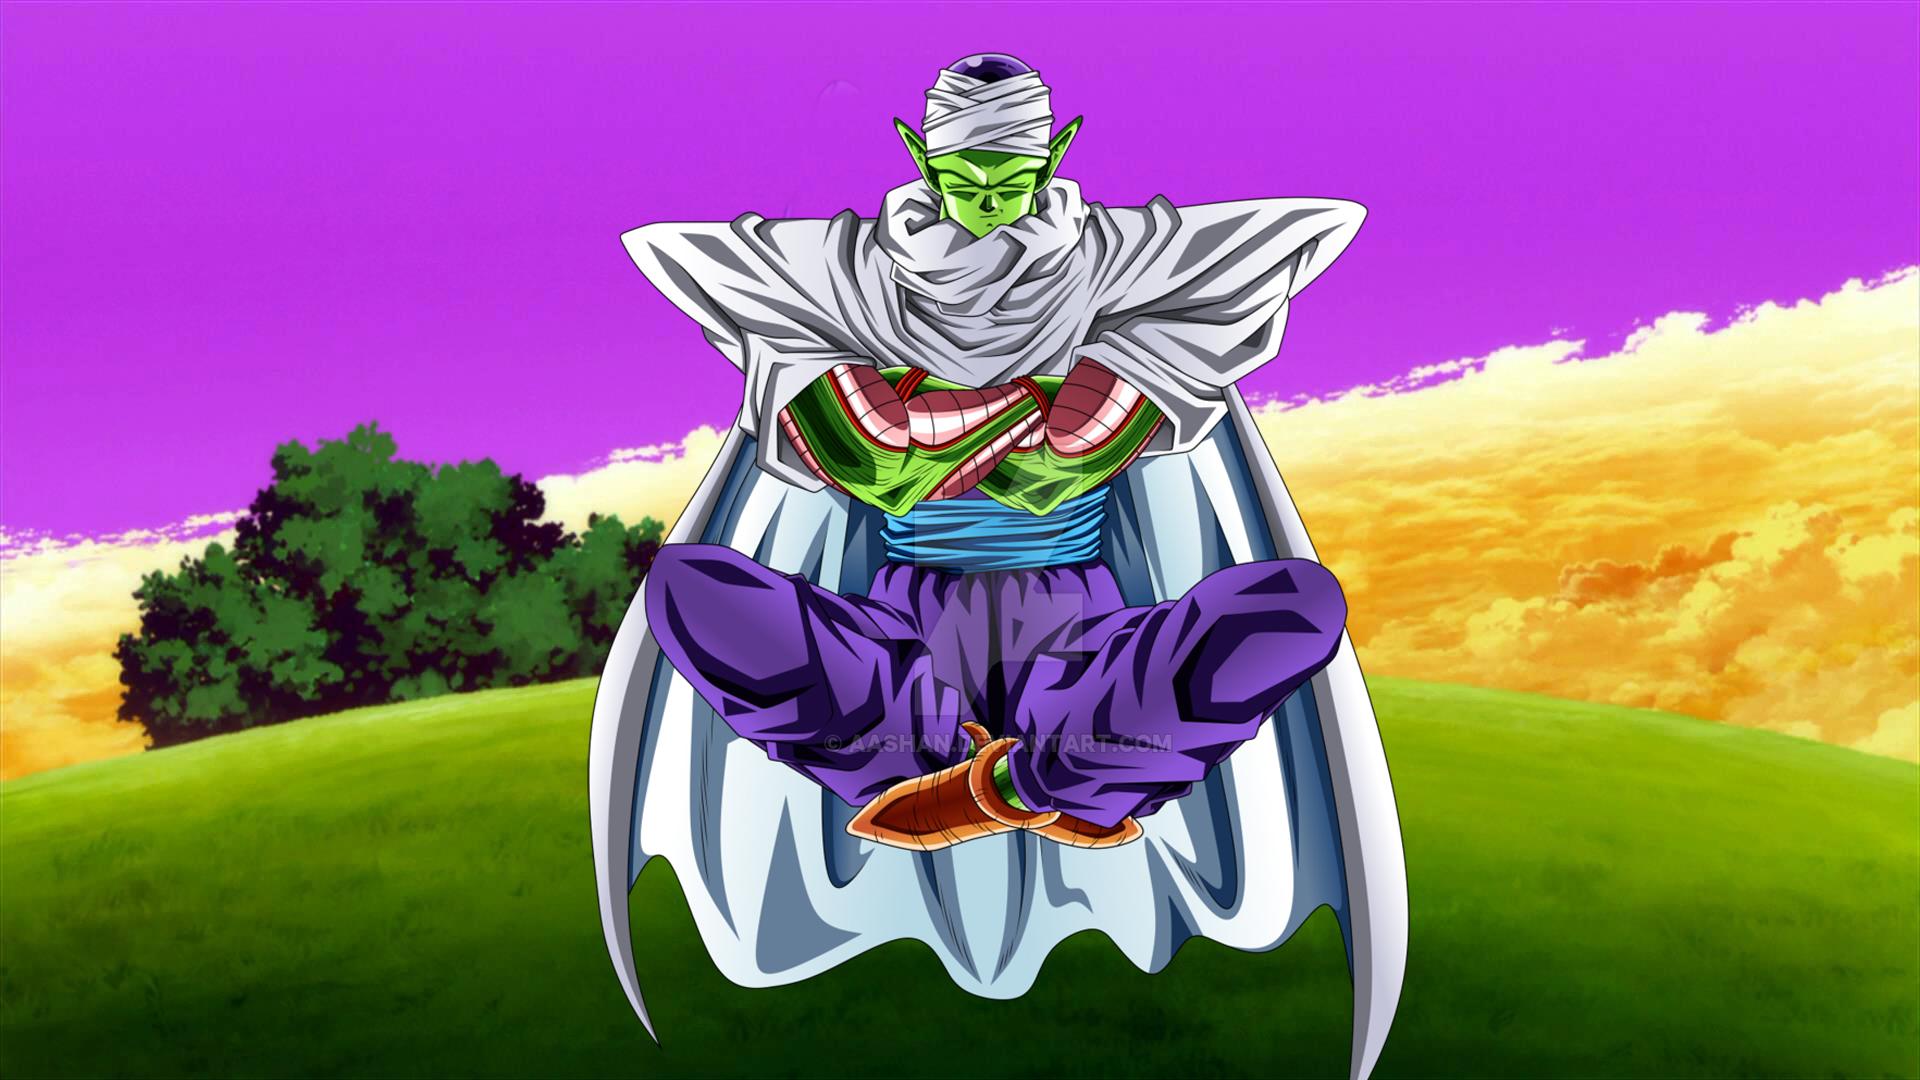 Kaiosama Mondo Dragon Ball Z Piccolo By Darthmach On Deviantart